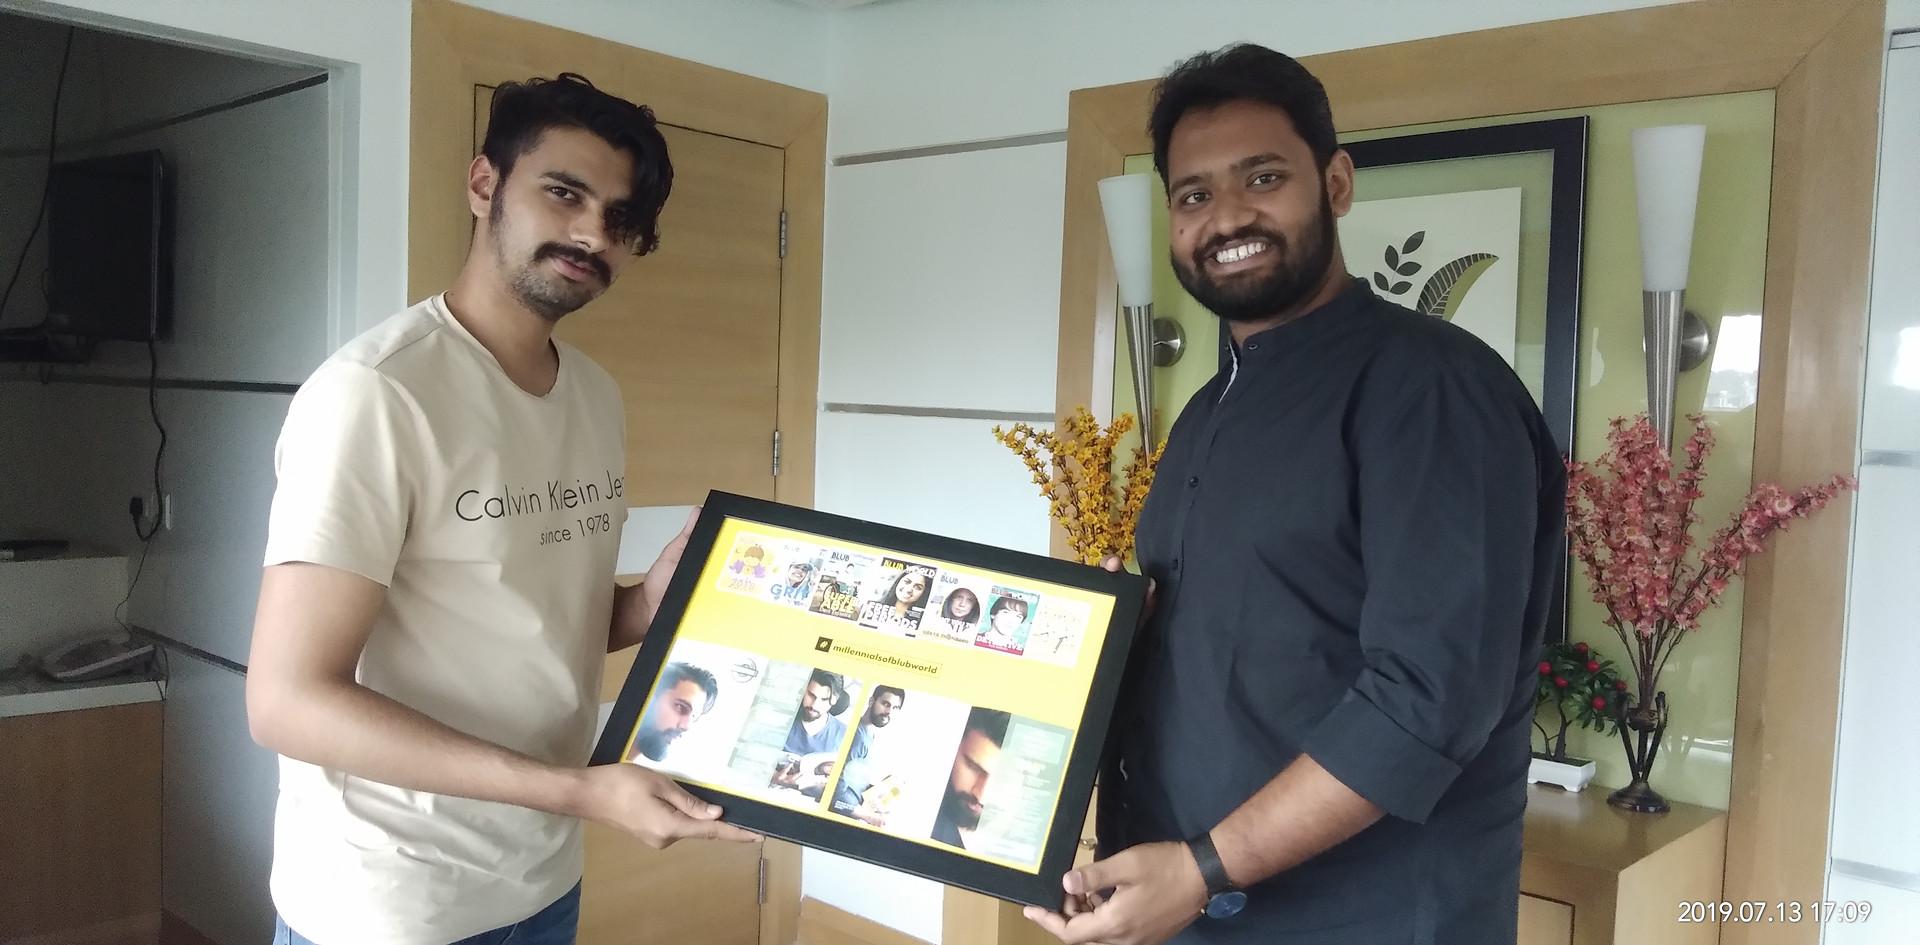 Mr. Mantraj Paliwal, Vice Chairman, Miraj Group receiving Blub World Frame from Mr. Daksh Gaur